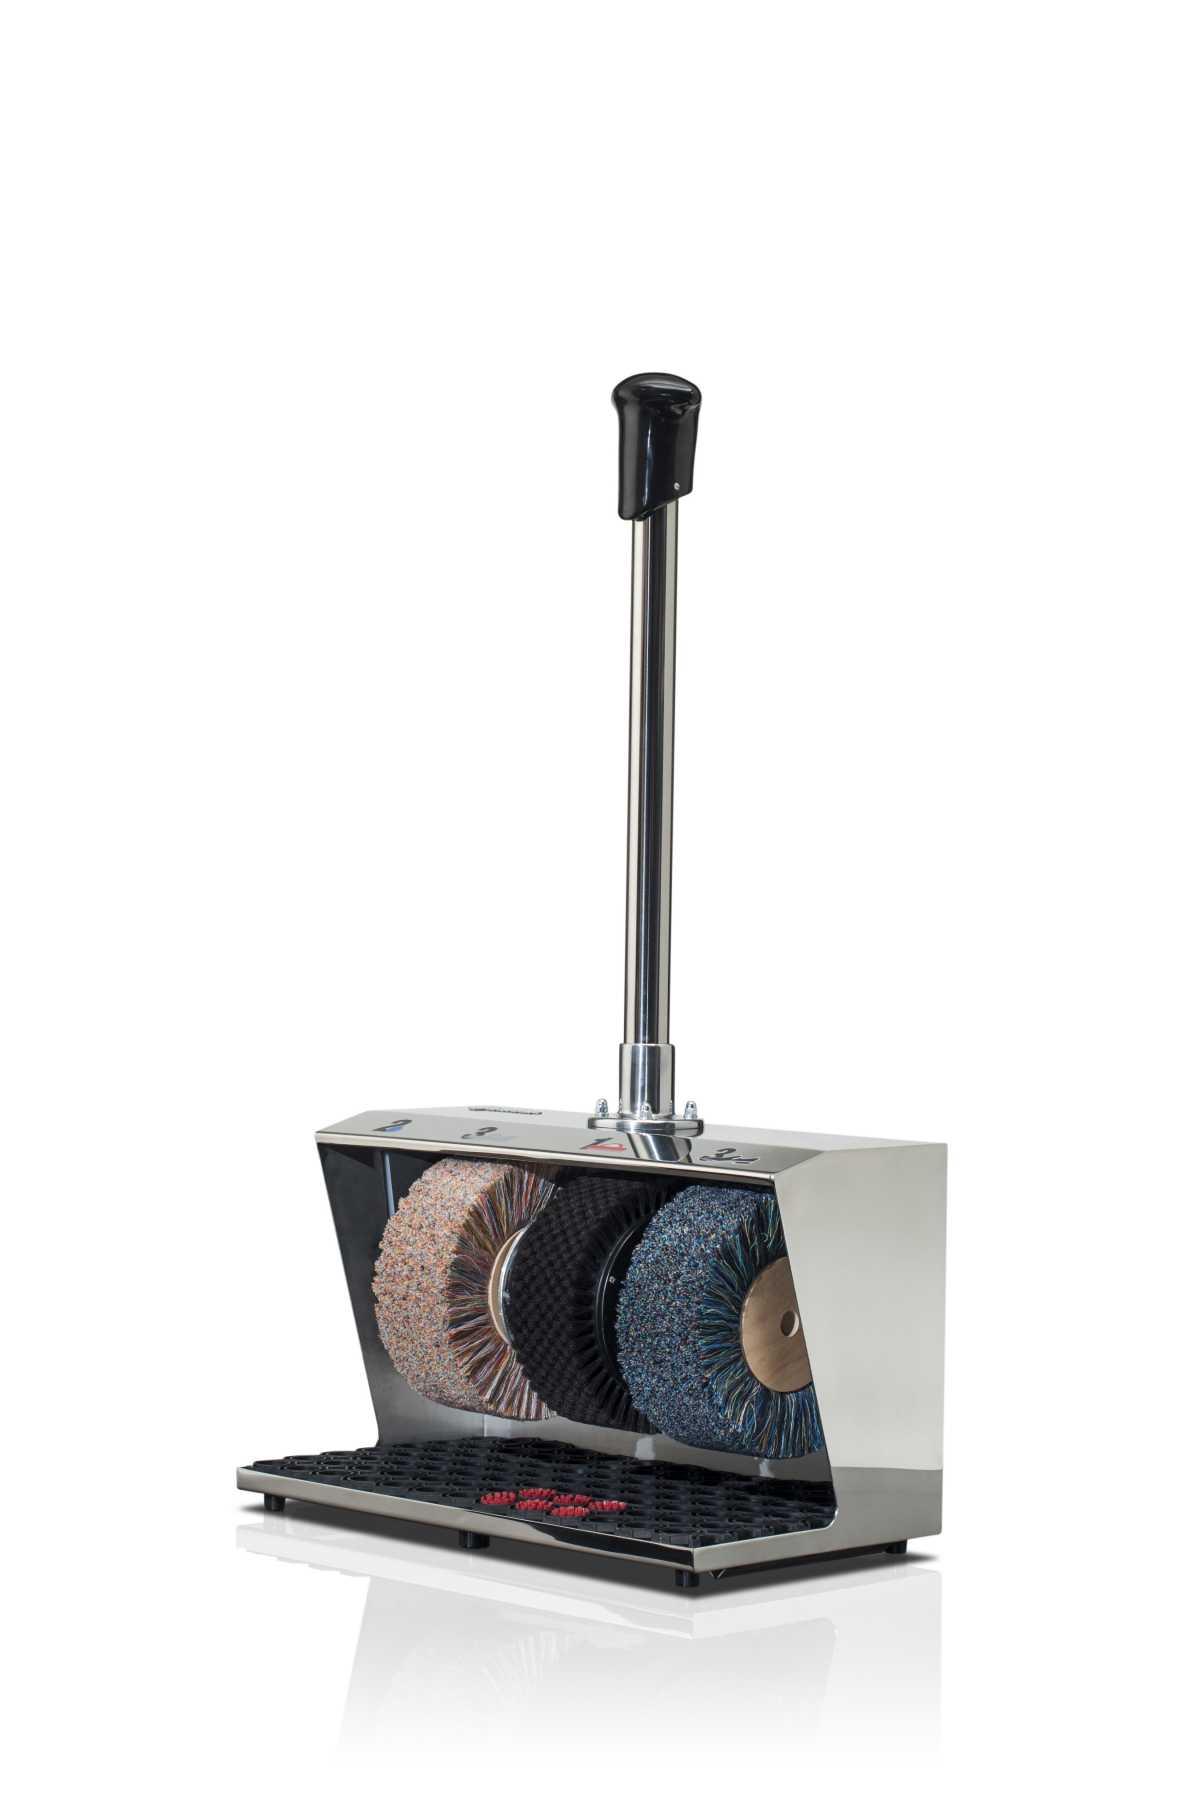 HEUTE Ayakkabı Cilalama Makinesi, Polifix 2